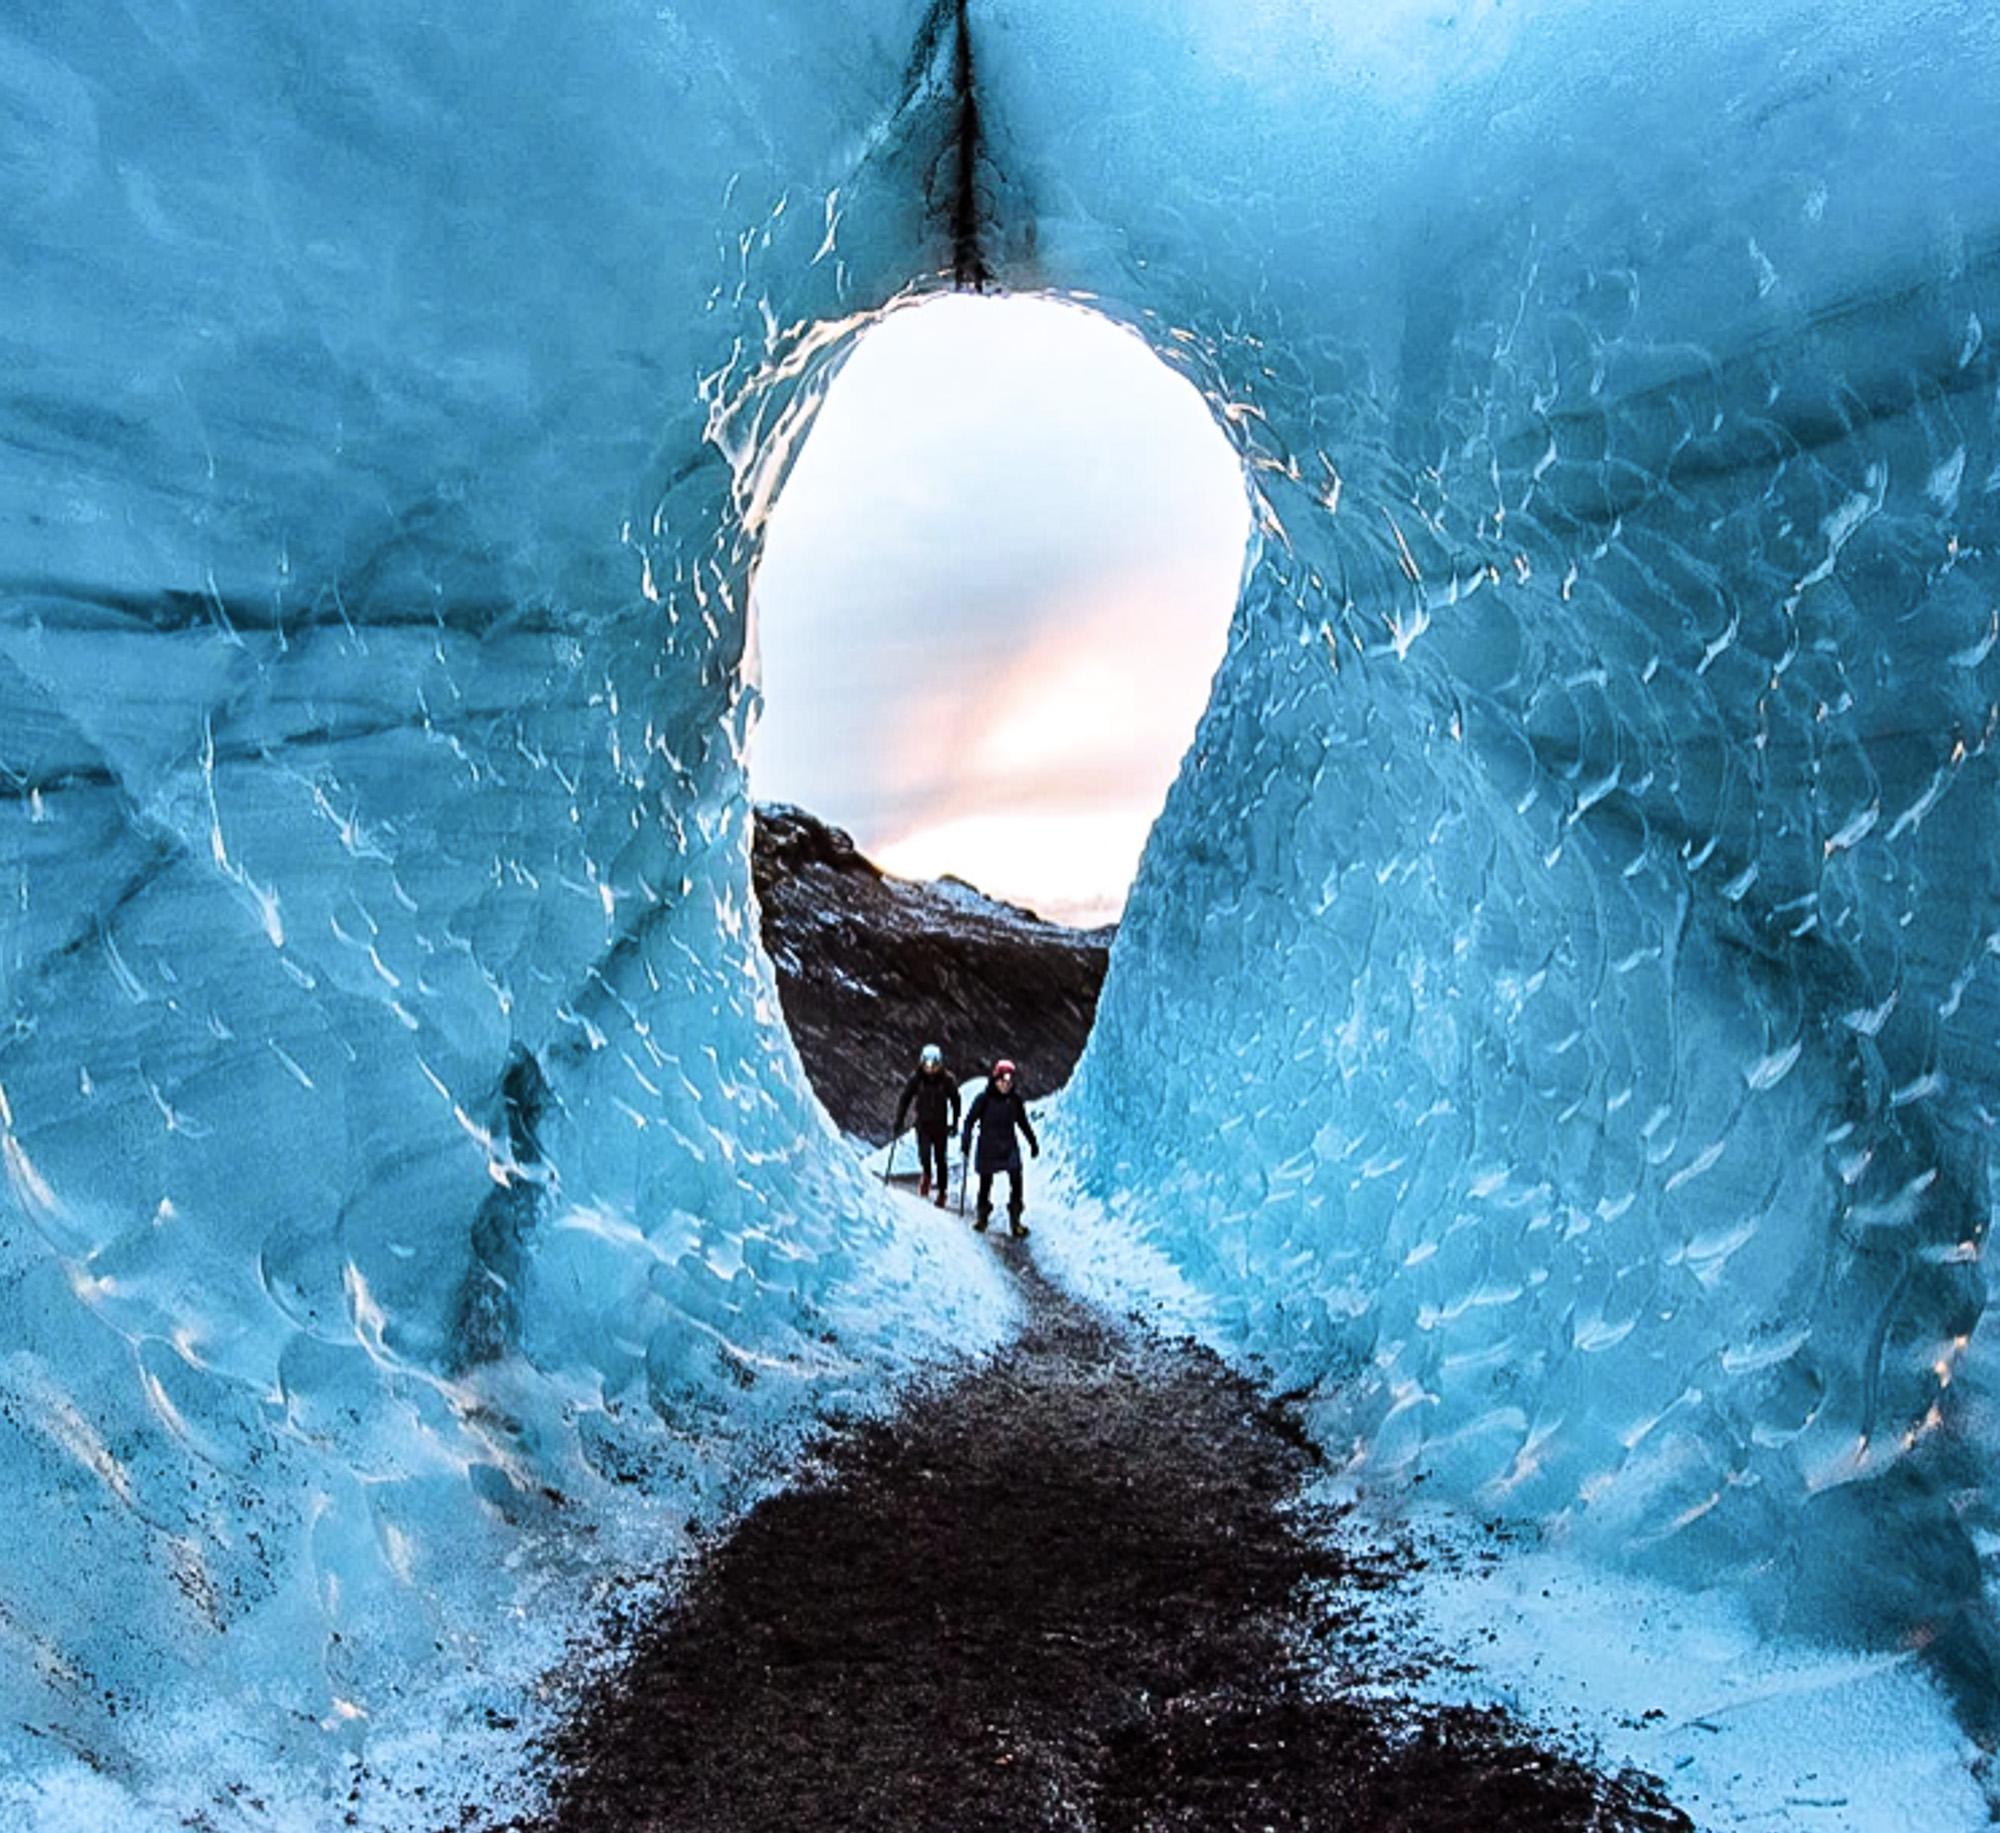 IceCavesJONAA©Agust Runarsson-.jpg